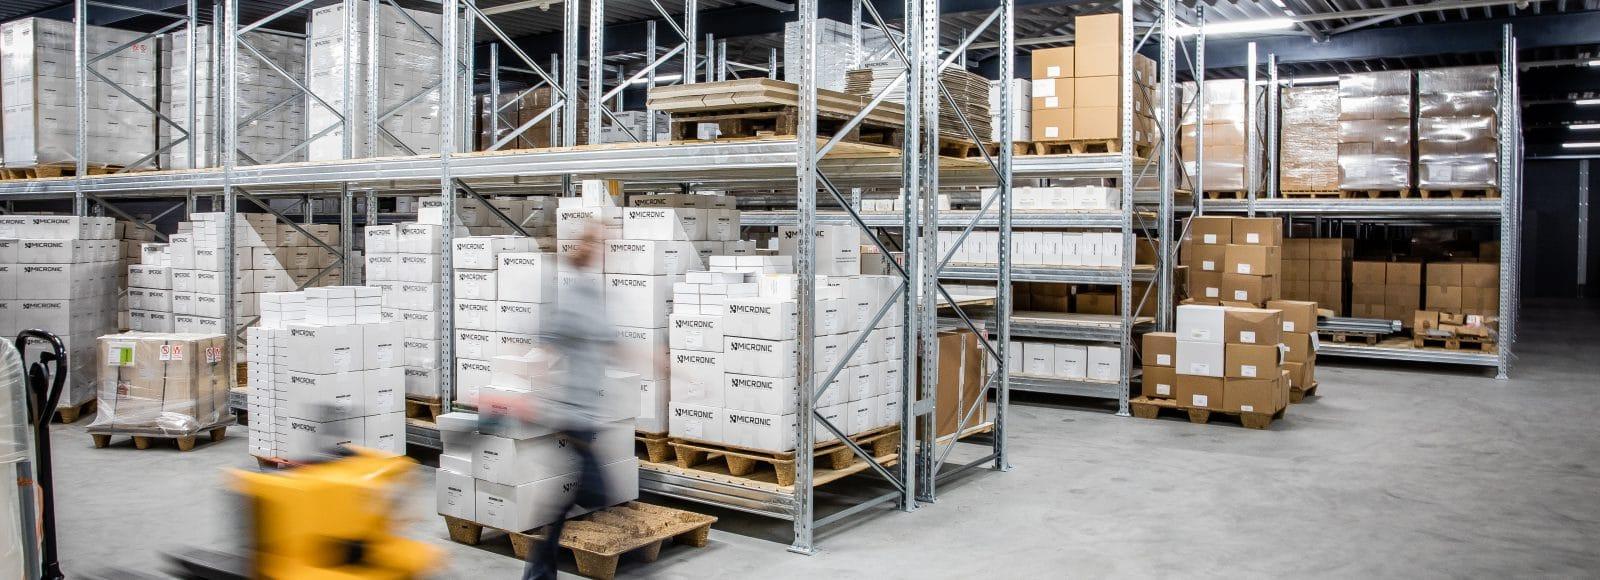 Micronic Warehouse